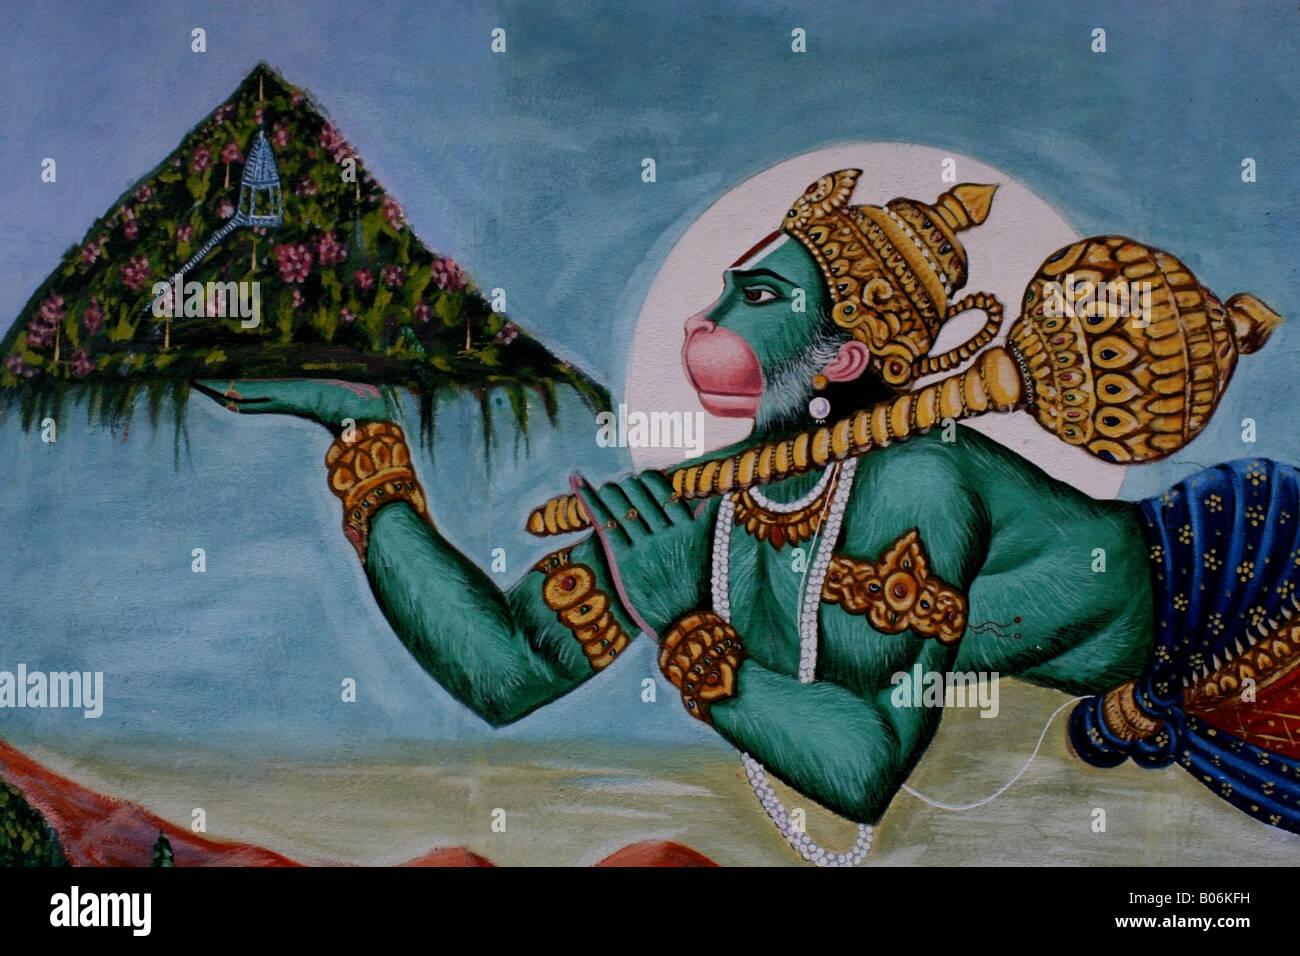 Mural of Hanuman the Hindu Monkey God carrying the ...